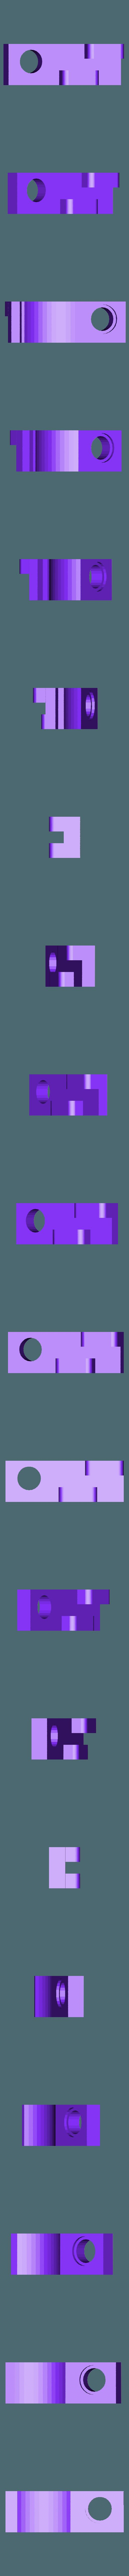 LAMPADAPTER.stl Download free STL file Ikea Jansjo V1017 Clamp Conversion Adapter • 3D printable object, Milan_Gajic